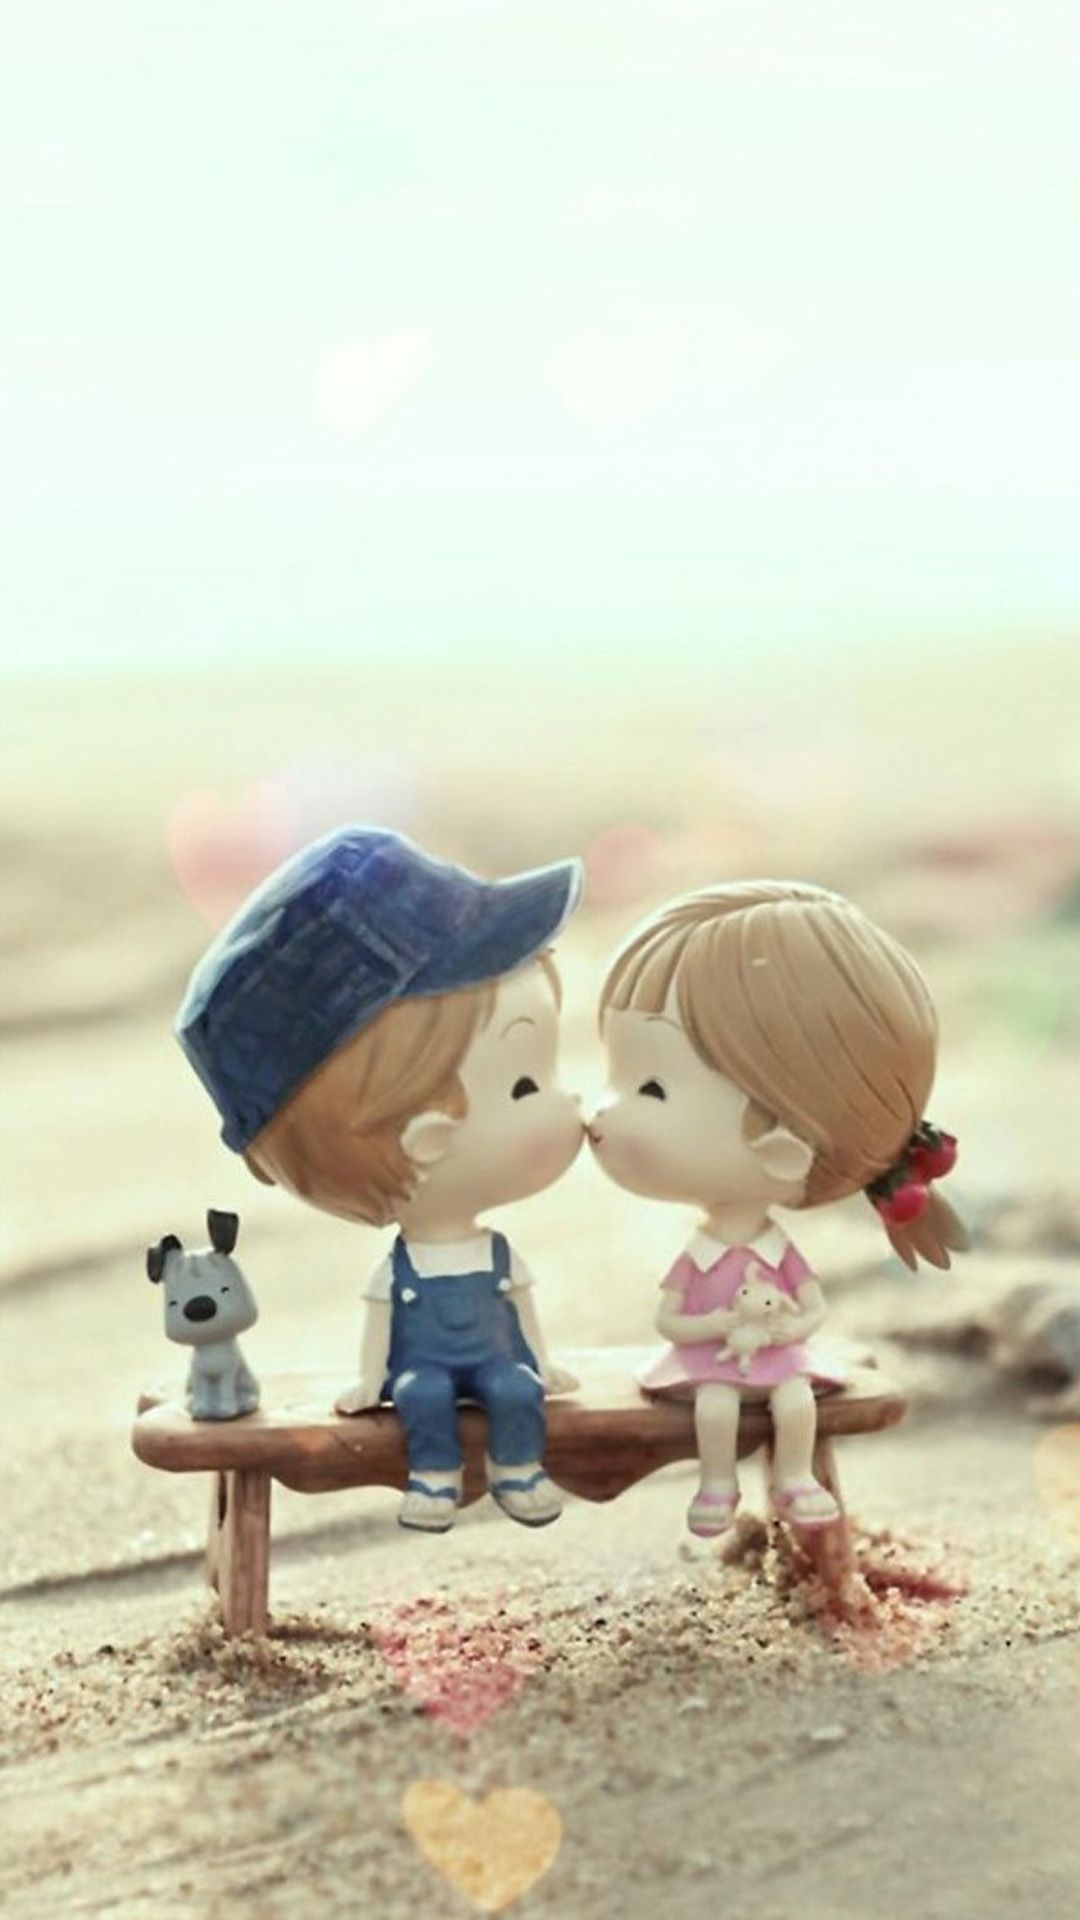 60 Cute Love Couple Phone Wallpapers Cute Love Wallpapers Cute Couple Cartoon Cute Love Cartoons